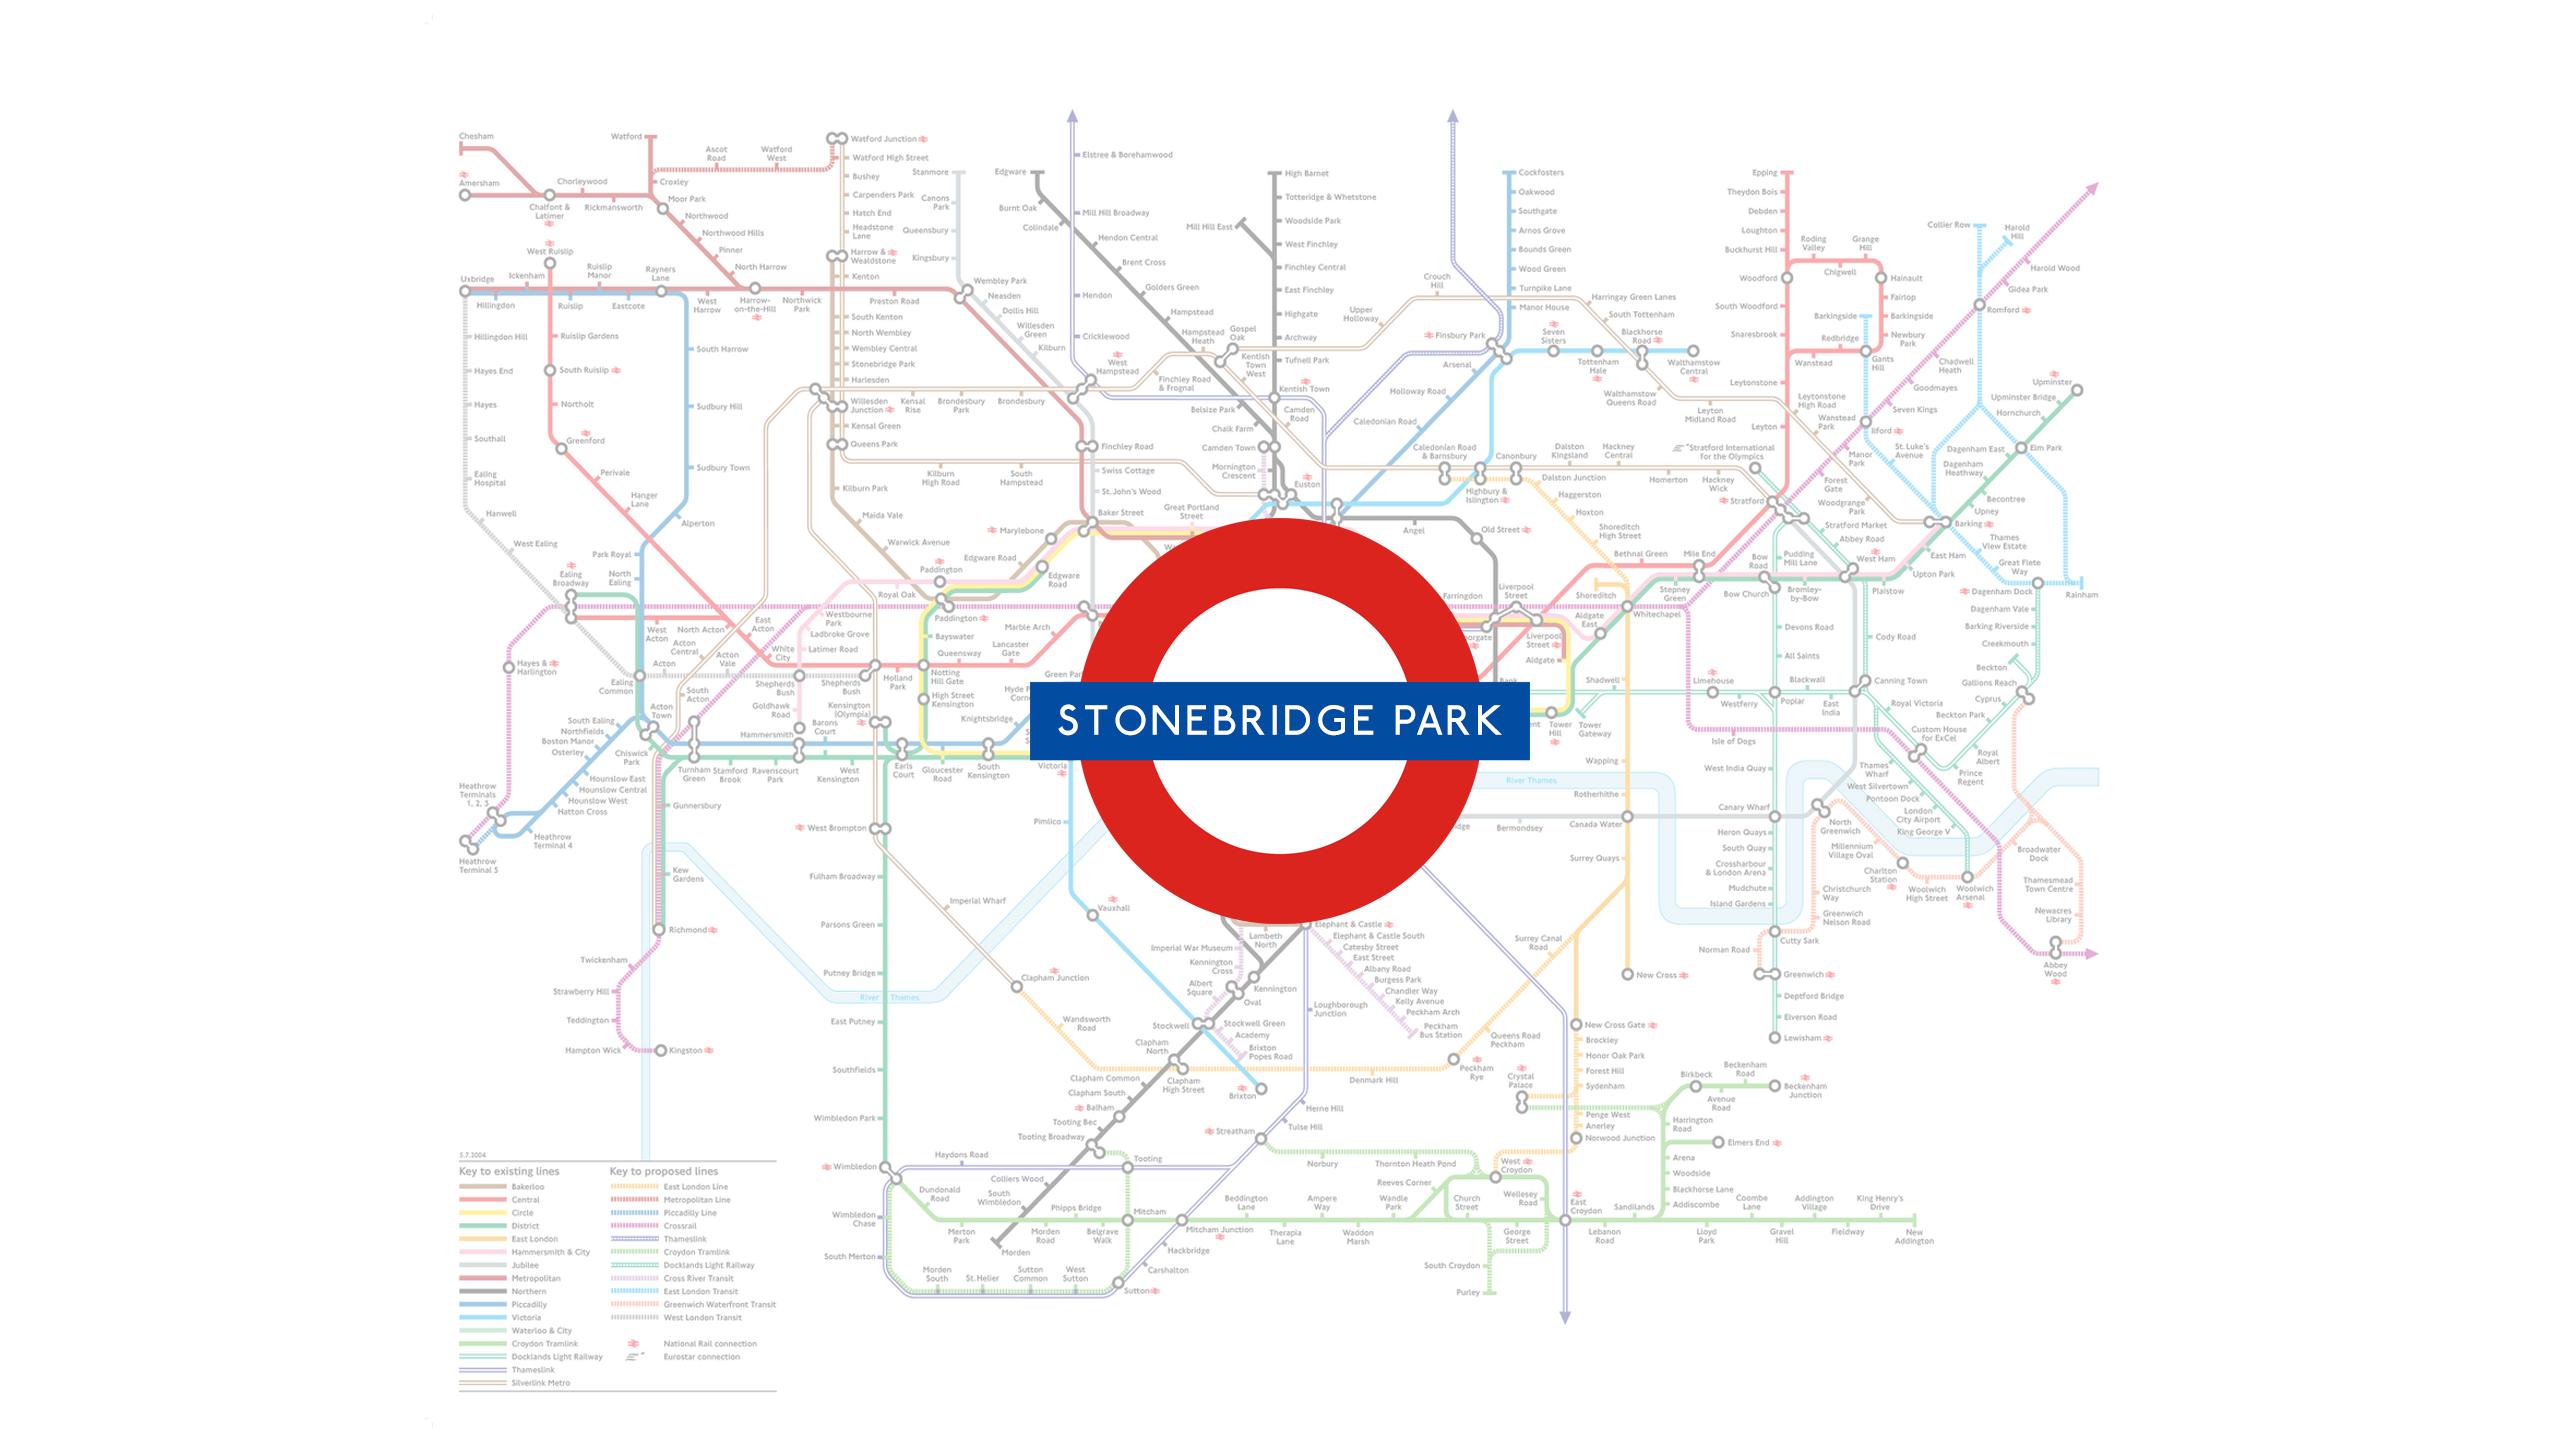 Stonebridge Park (Map)